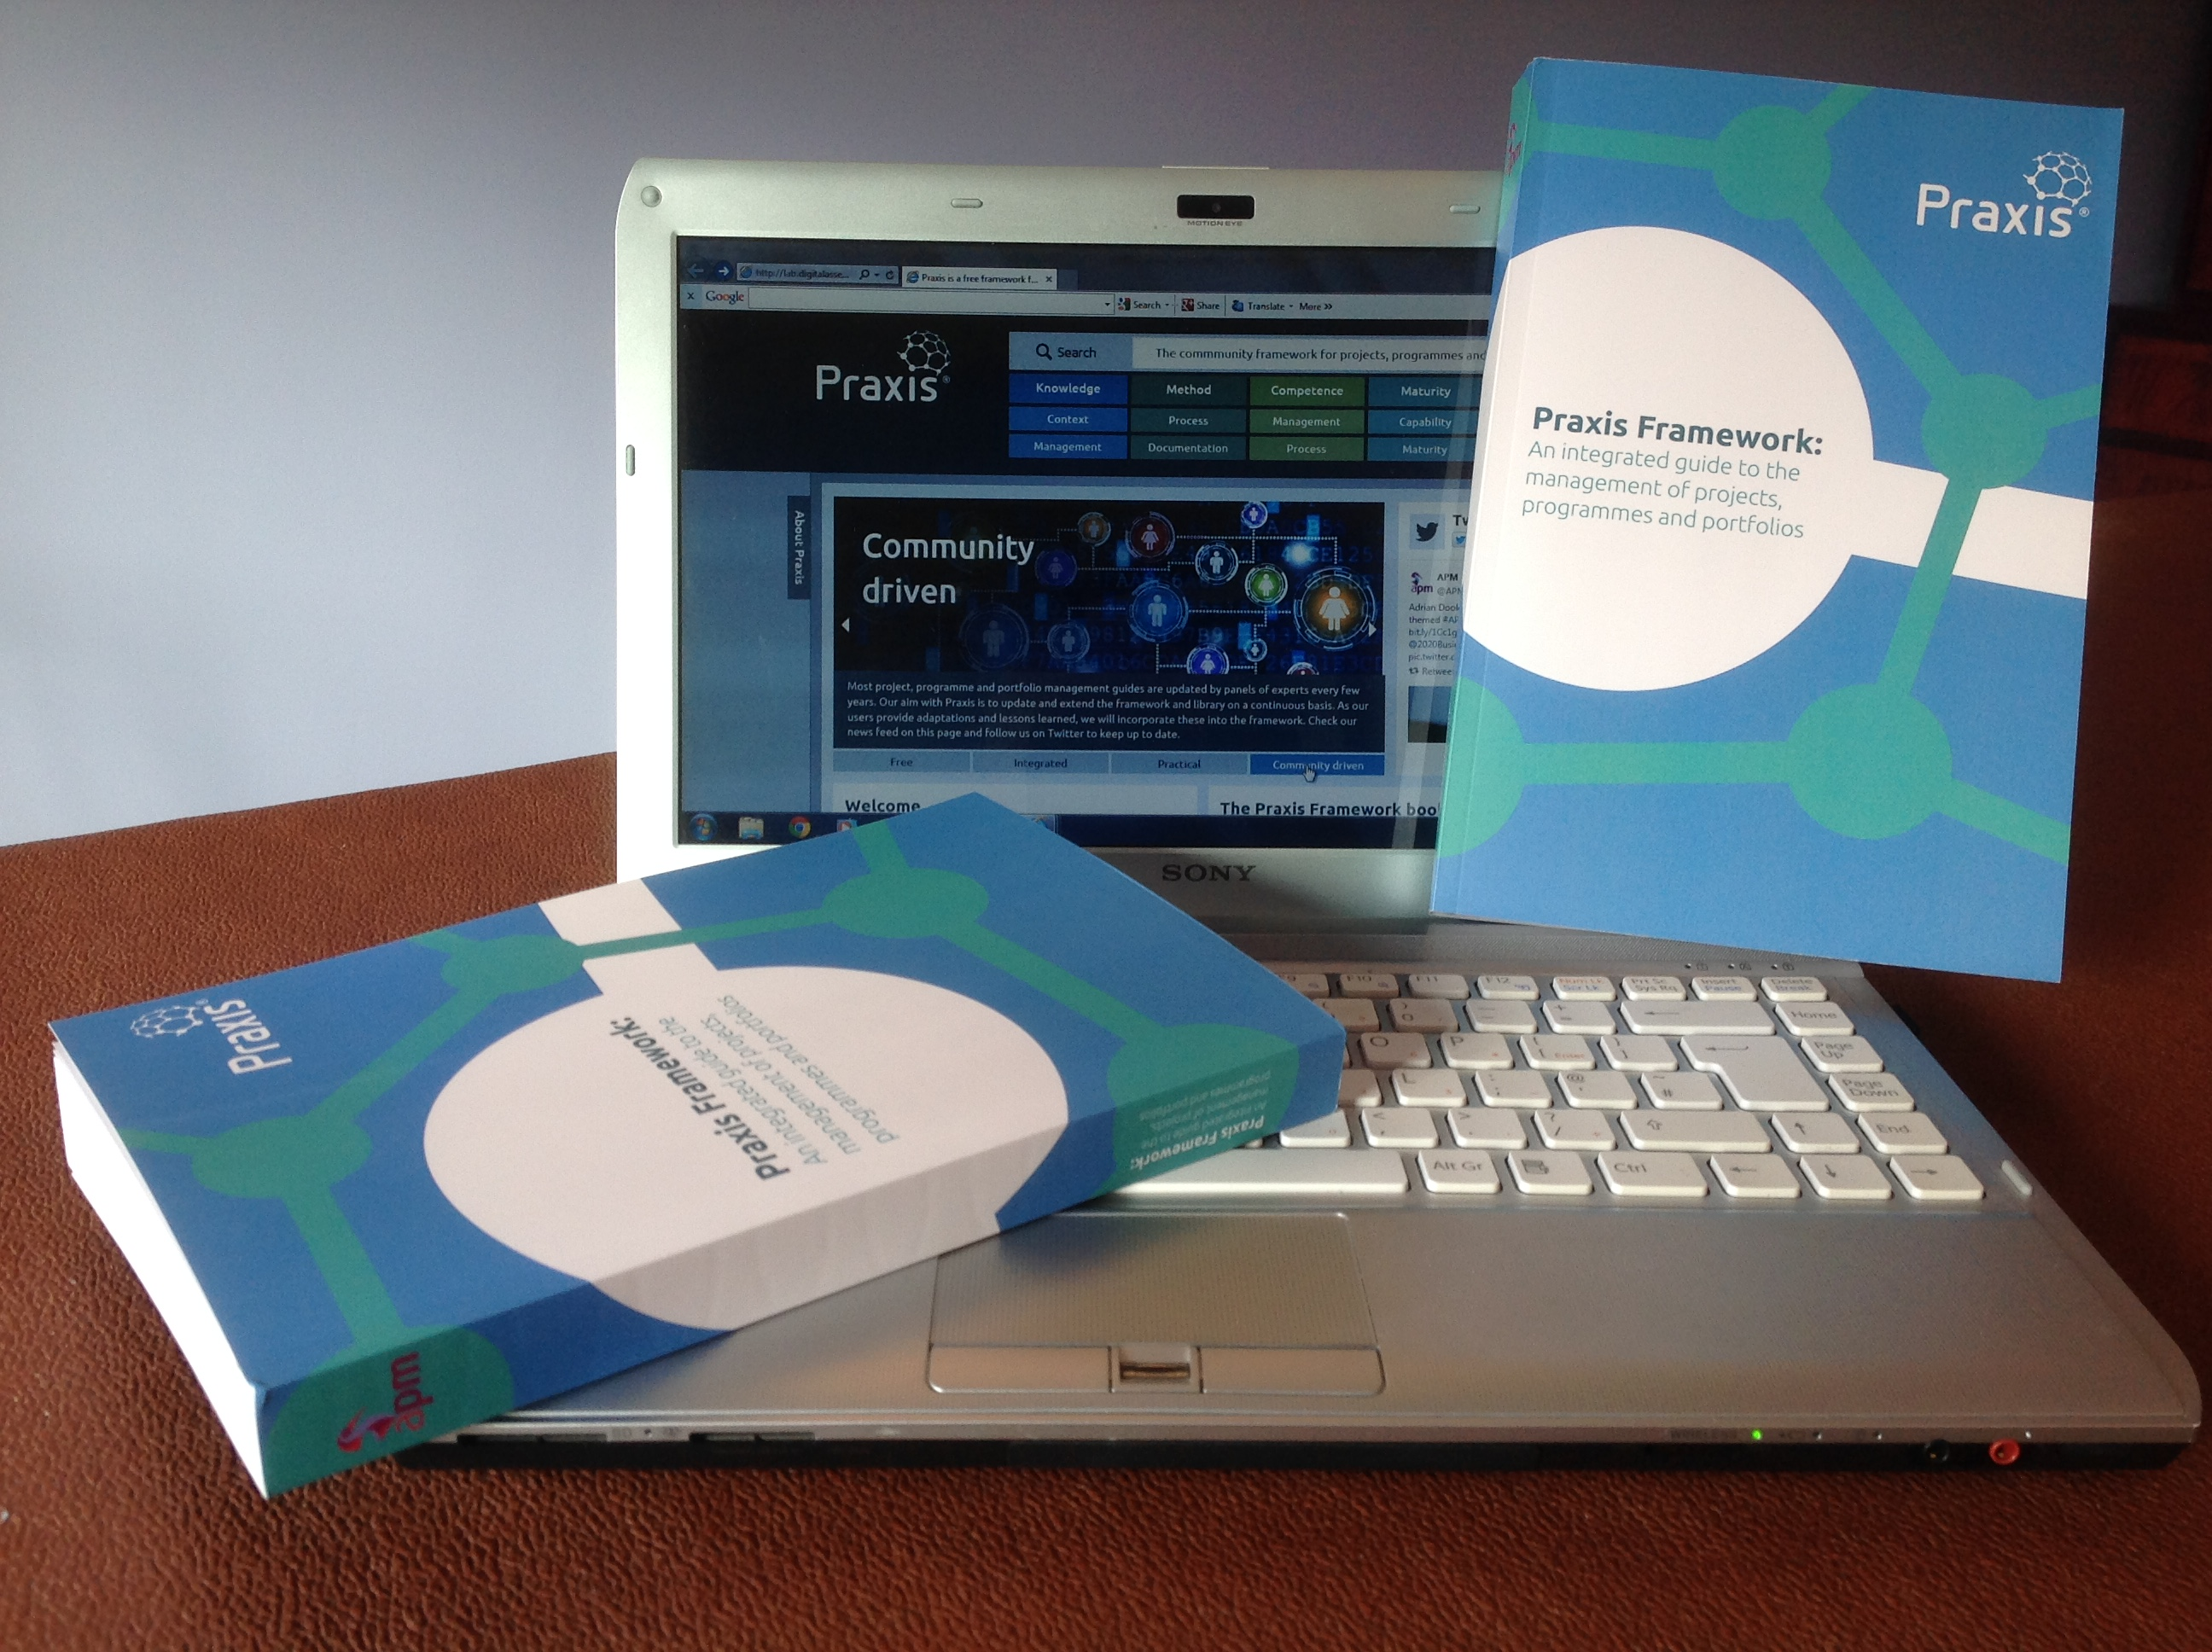 Praxis Framework published by APM